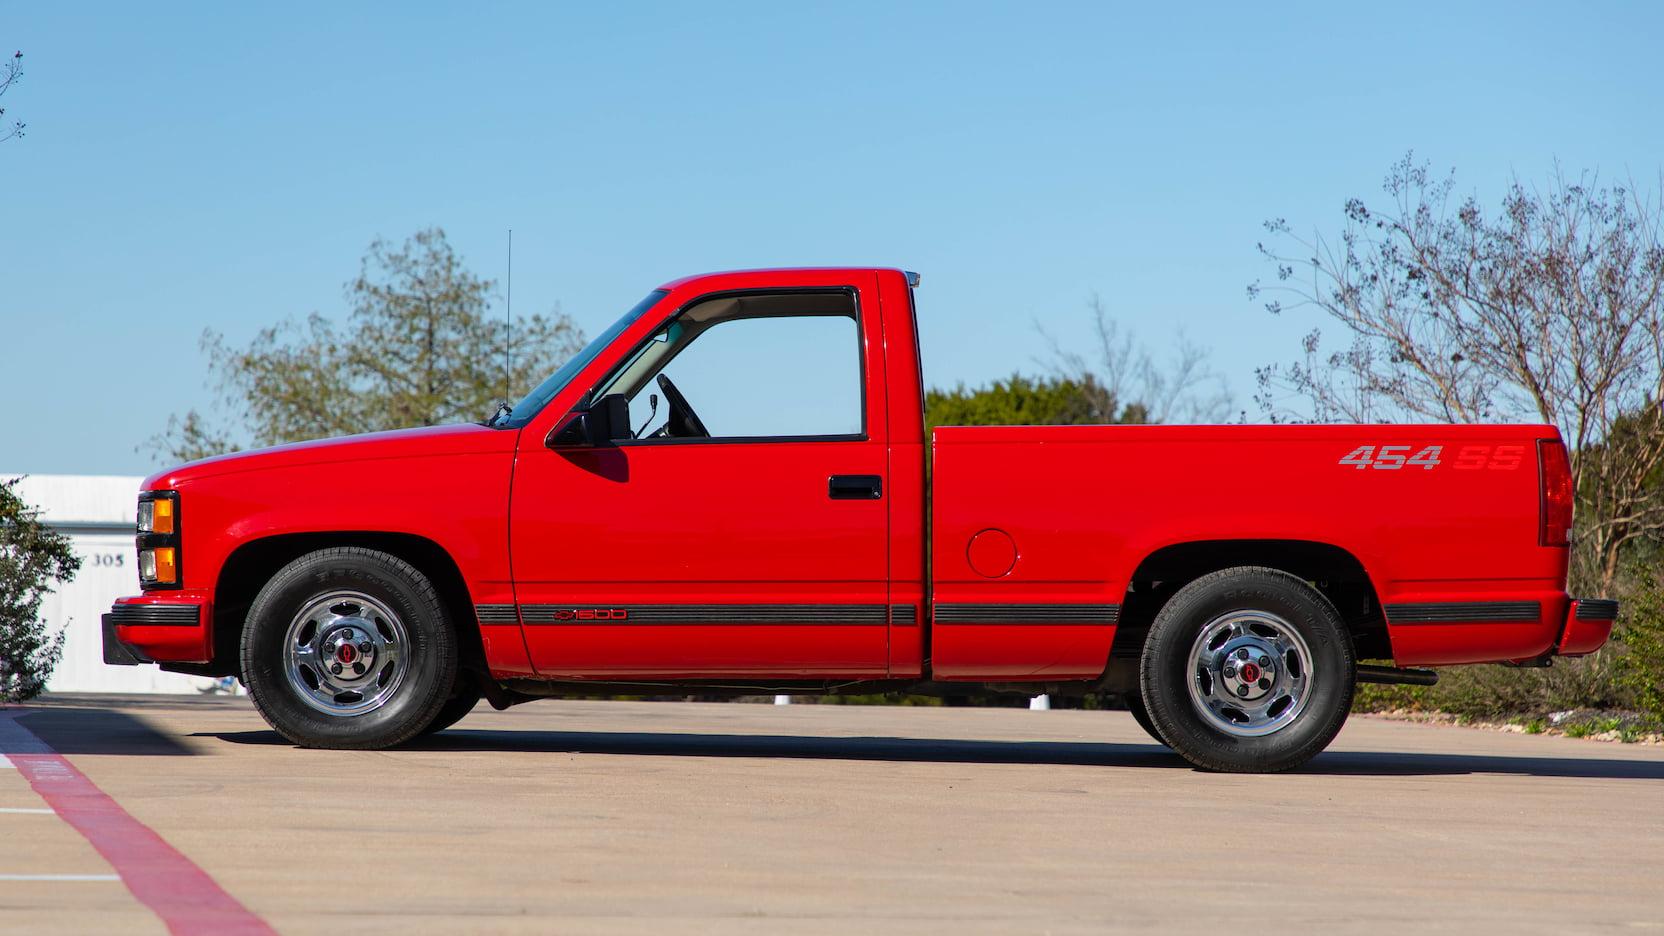 1993 Chevrolet 454 SS profile